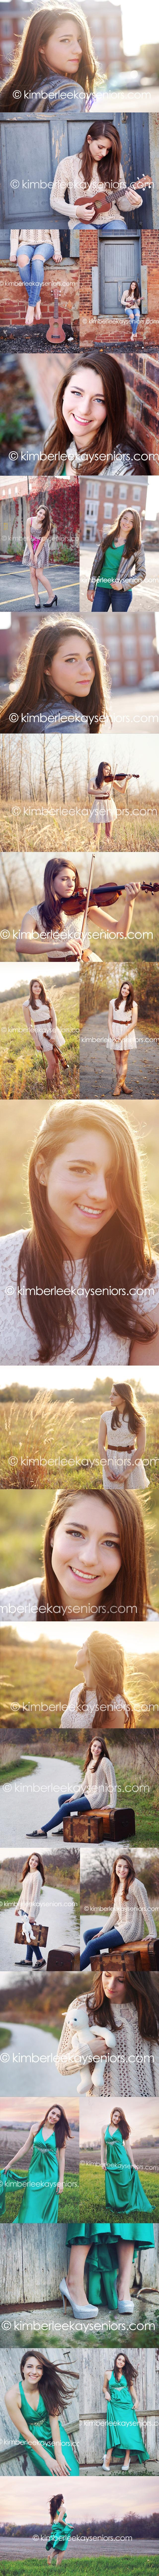 Wheaton Academy Senior Photographer | Kimberlee Kay Photography, Aurora IL